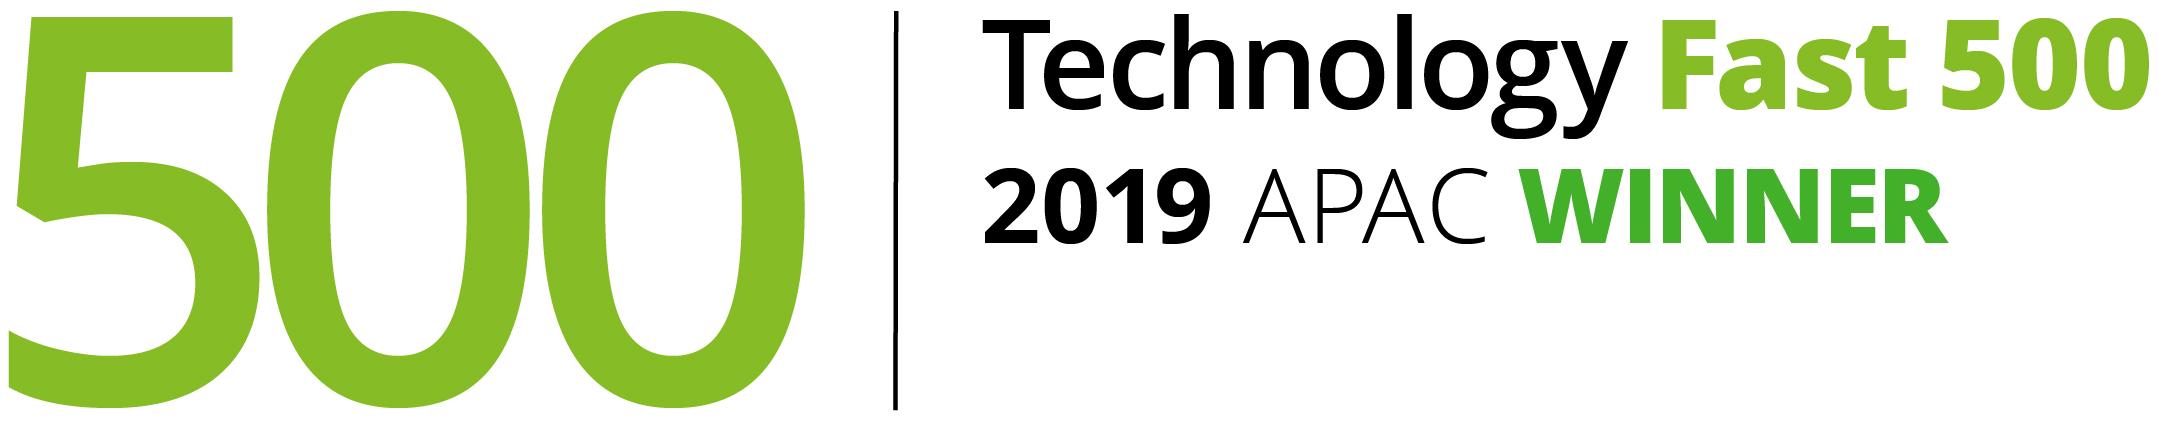 Technology Fast 500 2019 APAC Winner